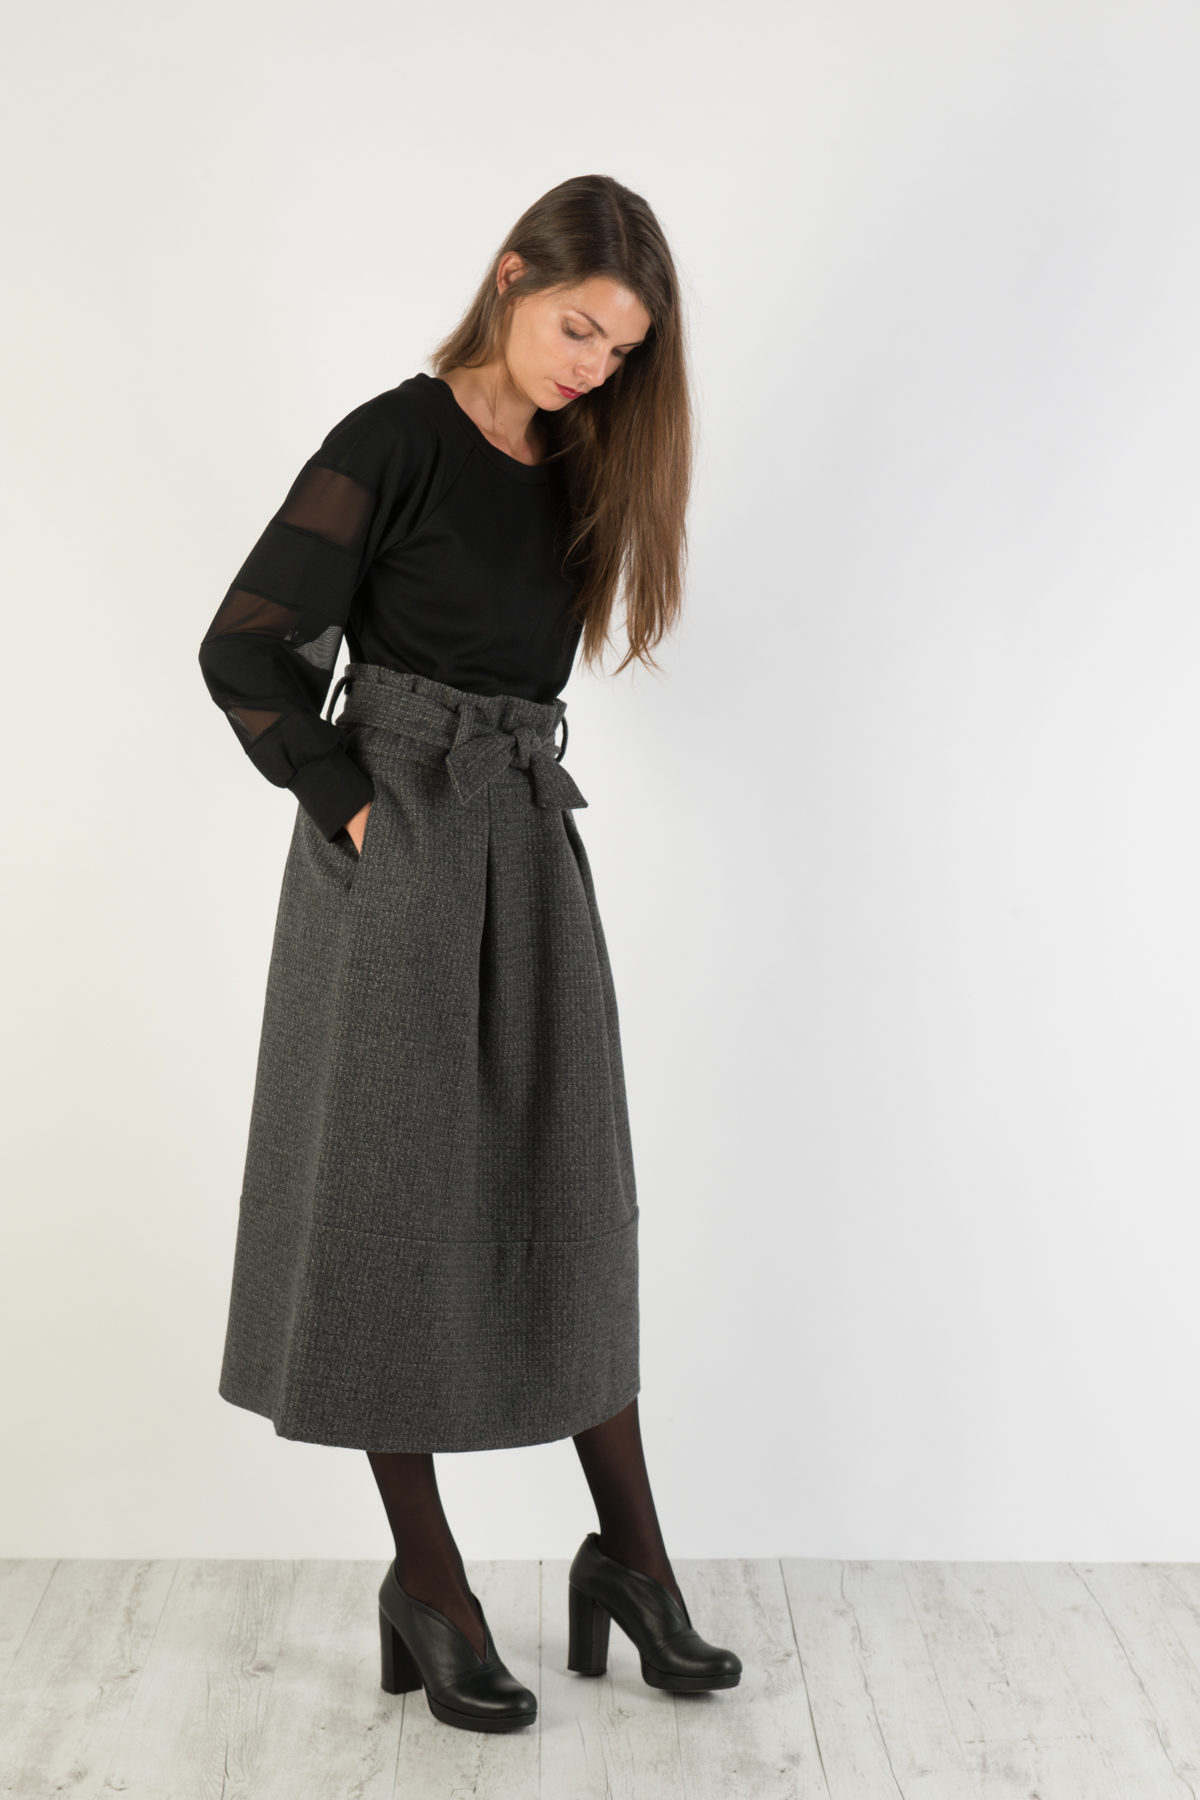 vendita calda autentica spedizione gratuita vendita economica High waisted skirt Florie gonna con maxi pinces